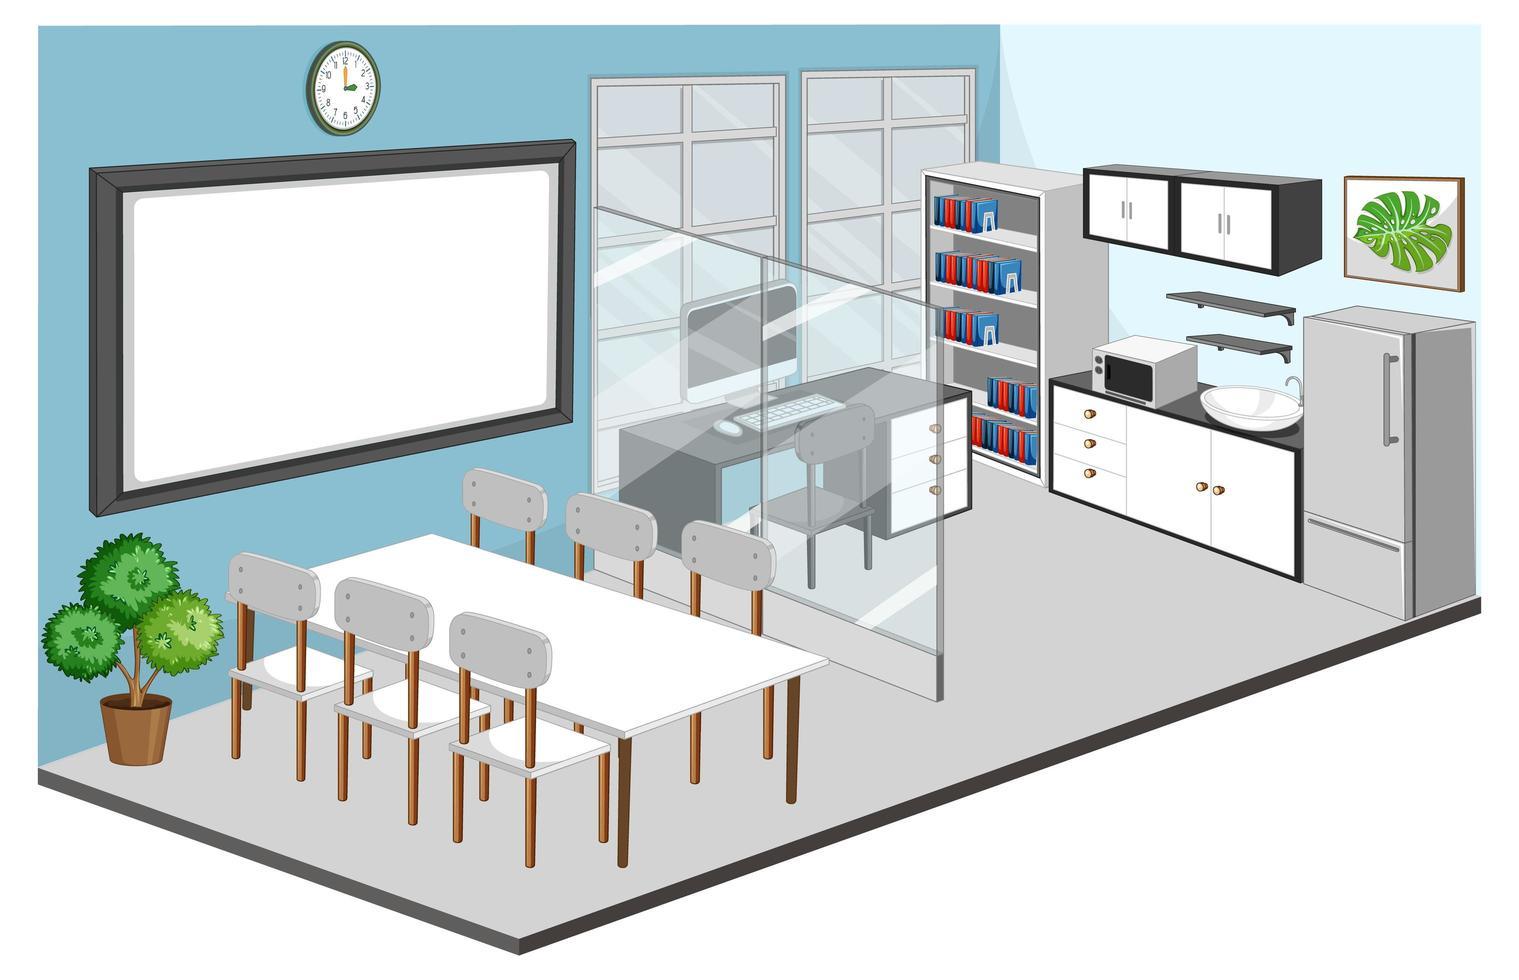 kantoorruimte en vergaderruimte interieur met meubilair vector